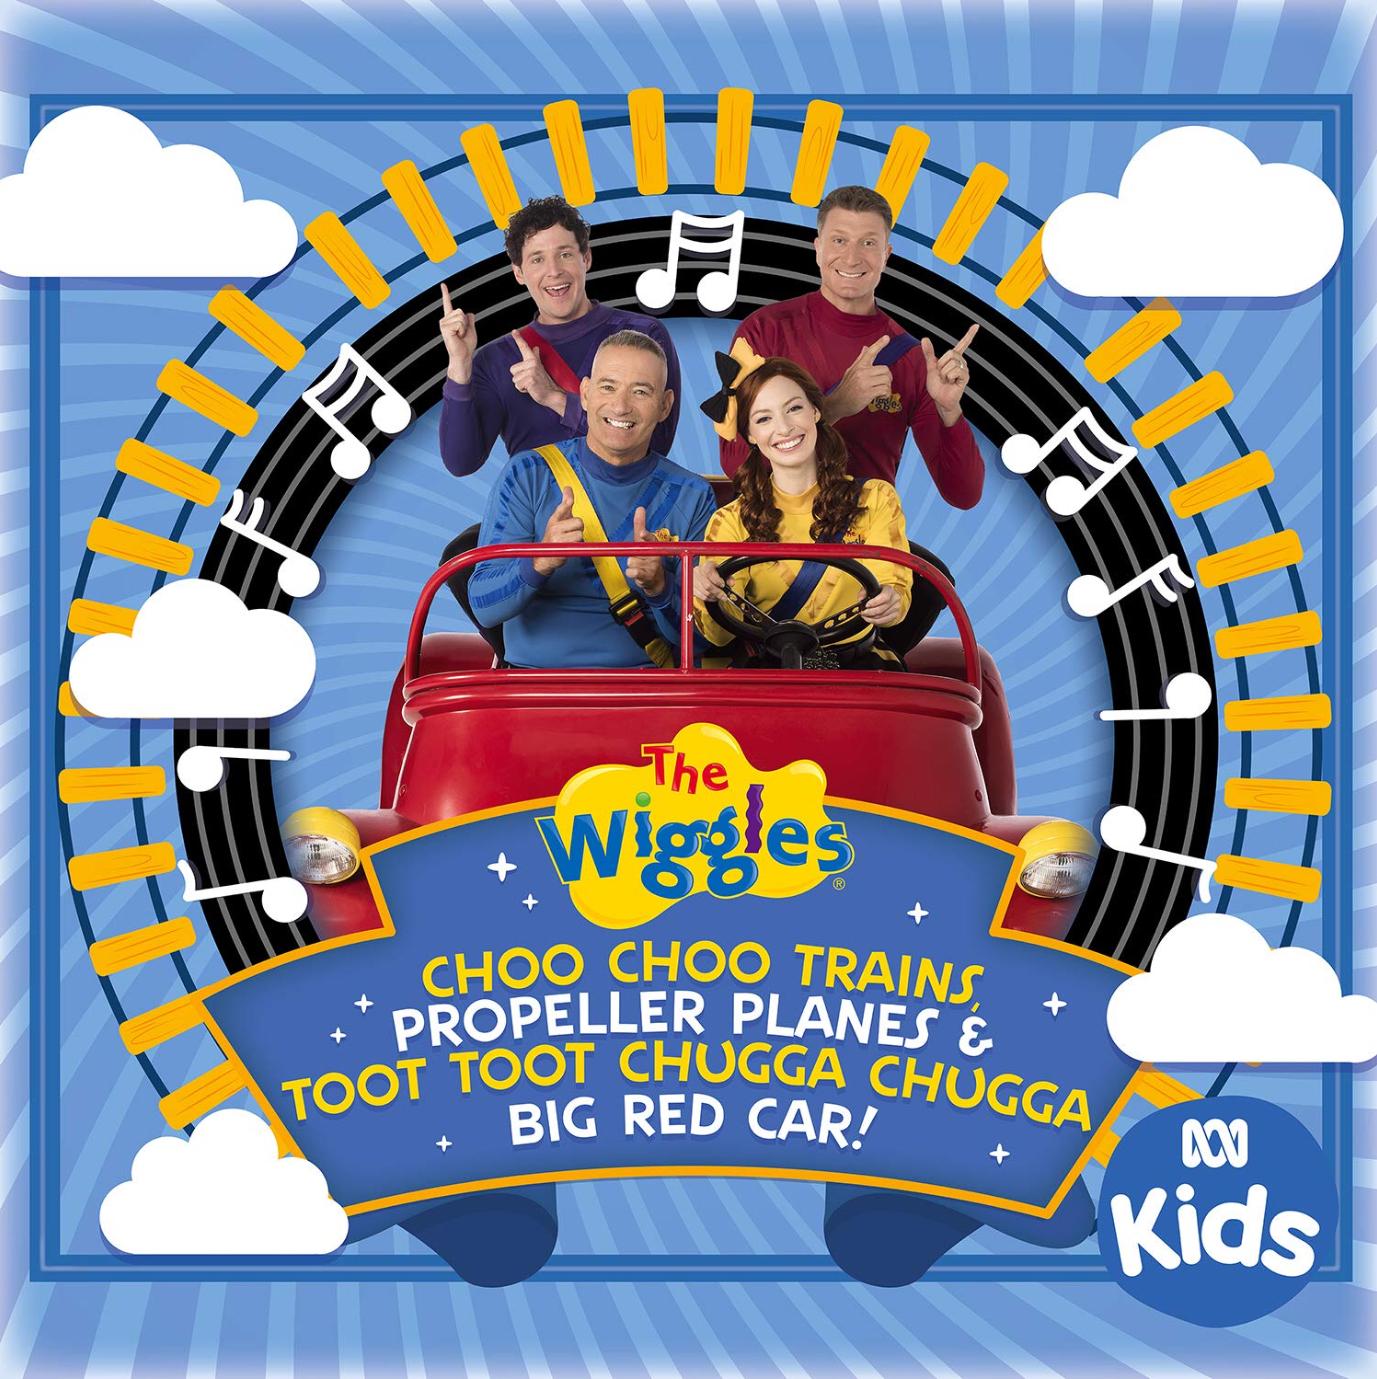 Choo Choo Trains, Propeller Planes & Toot Toot Chugga Chugga Big Red Car! (album)